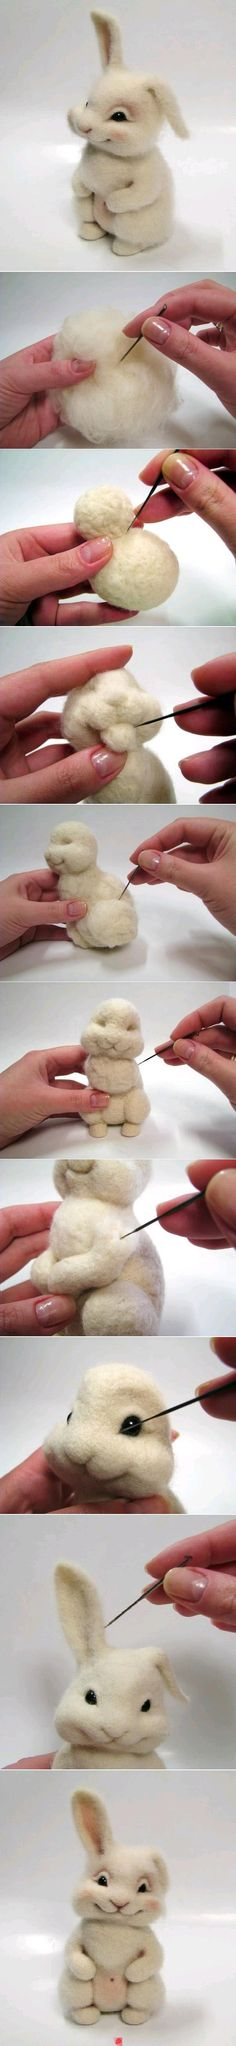 Cute needle felt handmade rabbit- cool diy idea